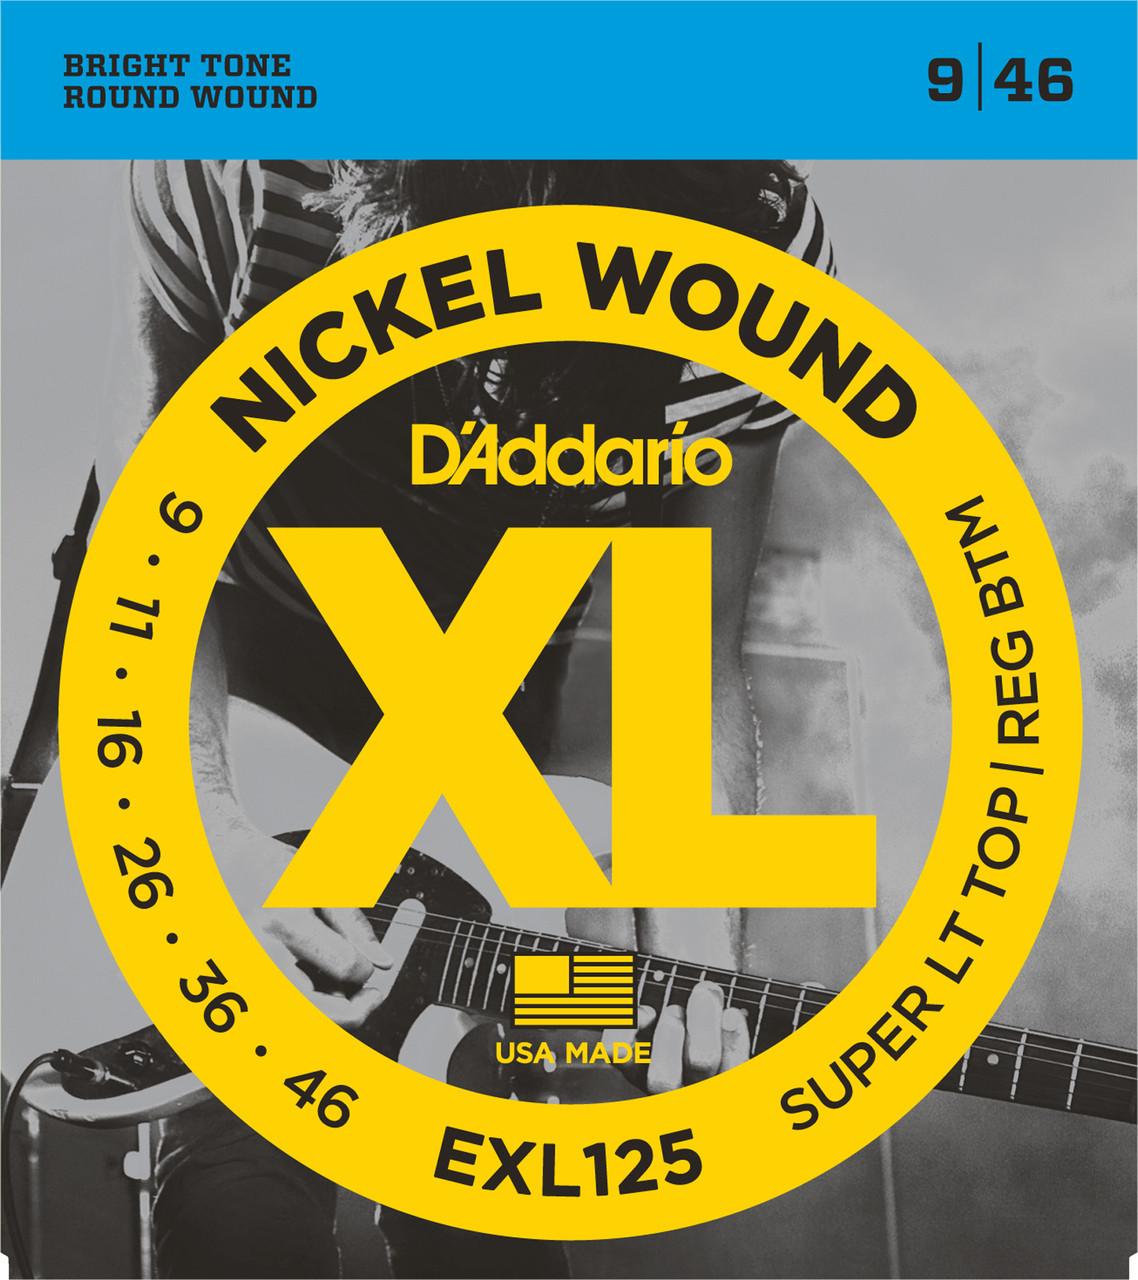 D'addario EXL125 Electric Guitar Strings (9-46)